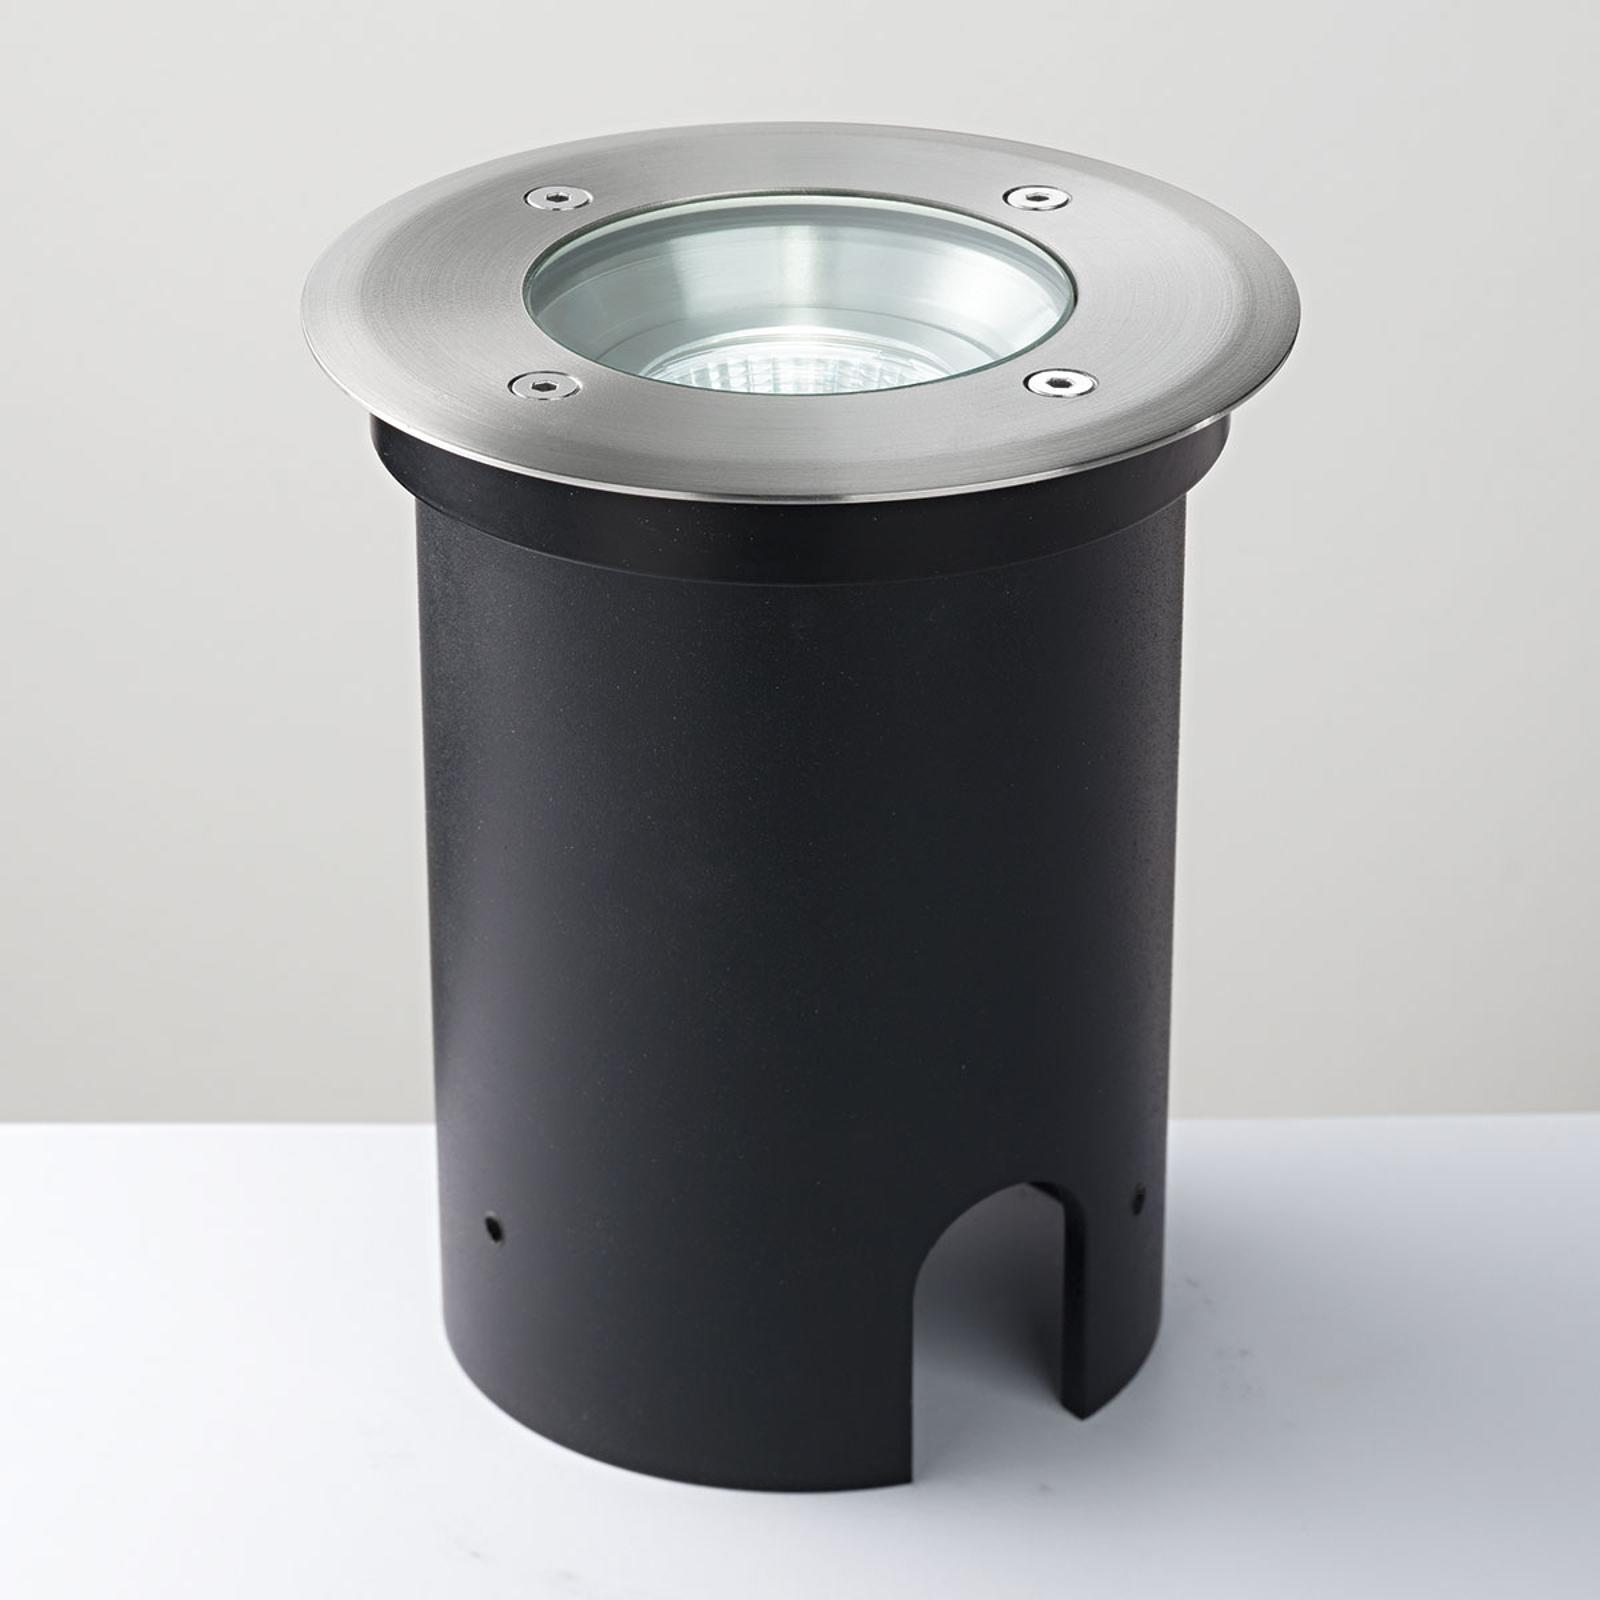 Scotty 3 LED-gulvindbygningslampe, IP67